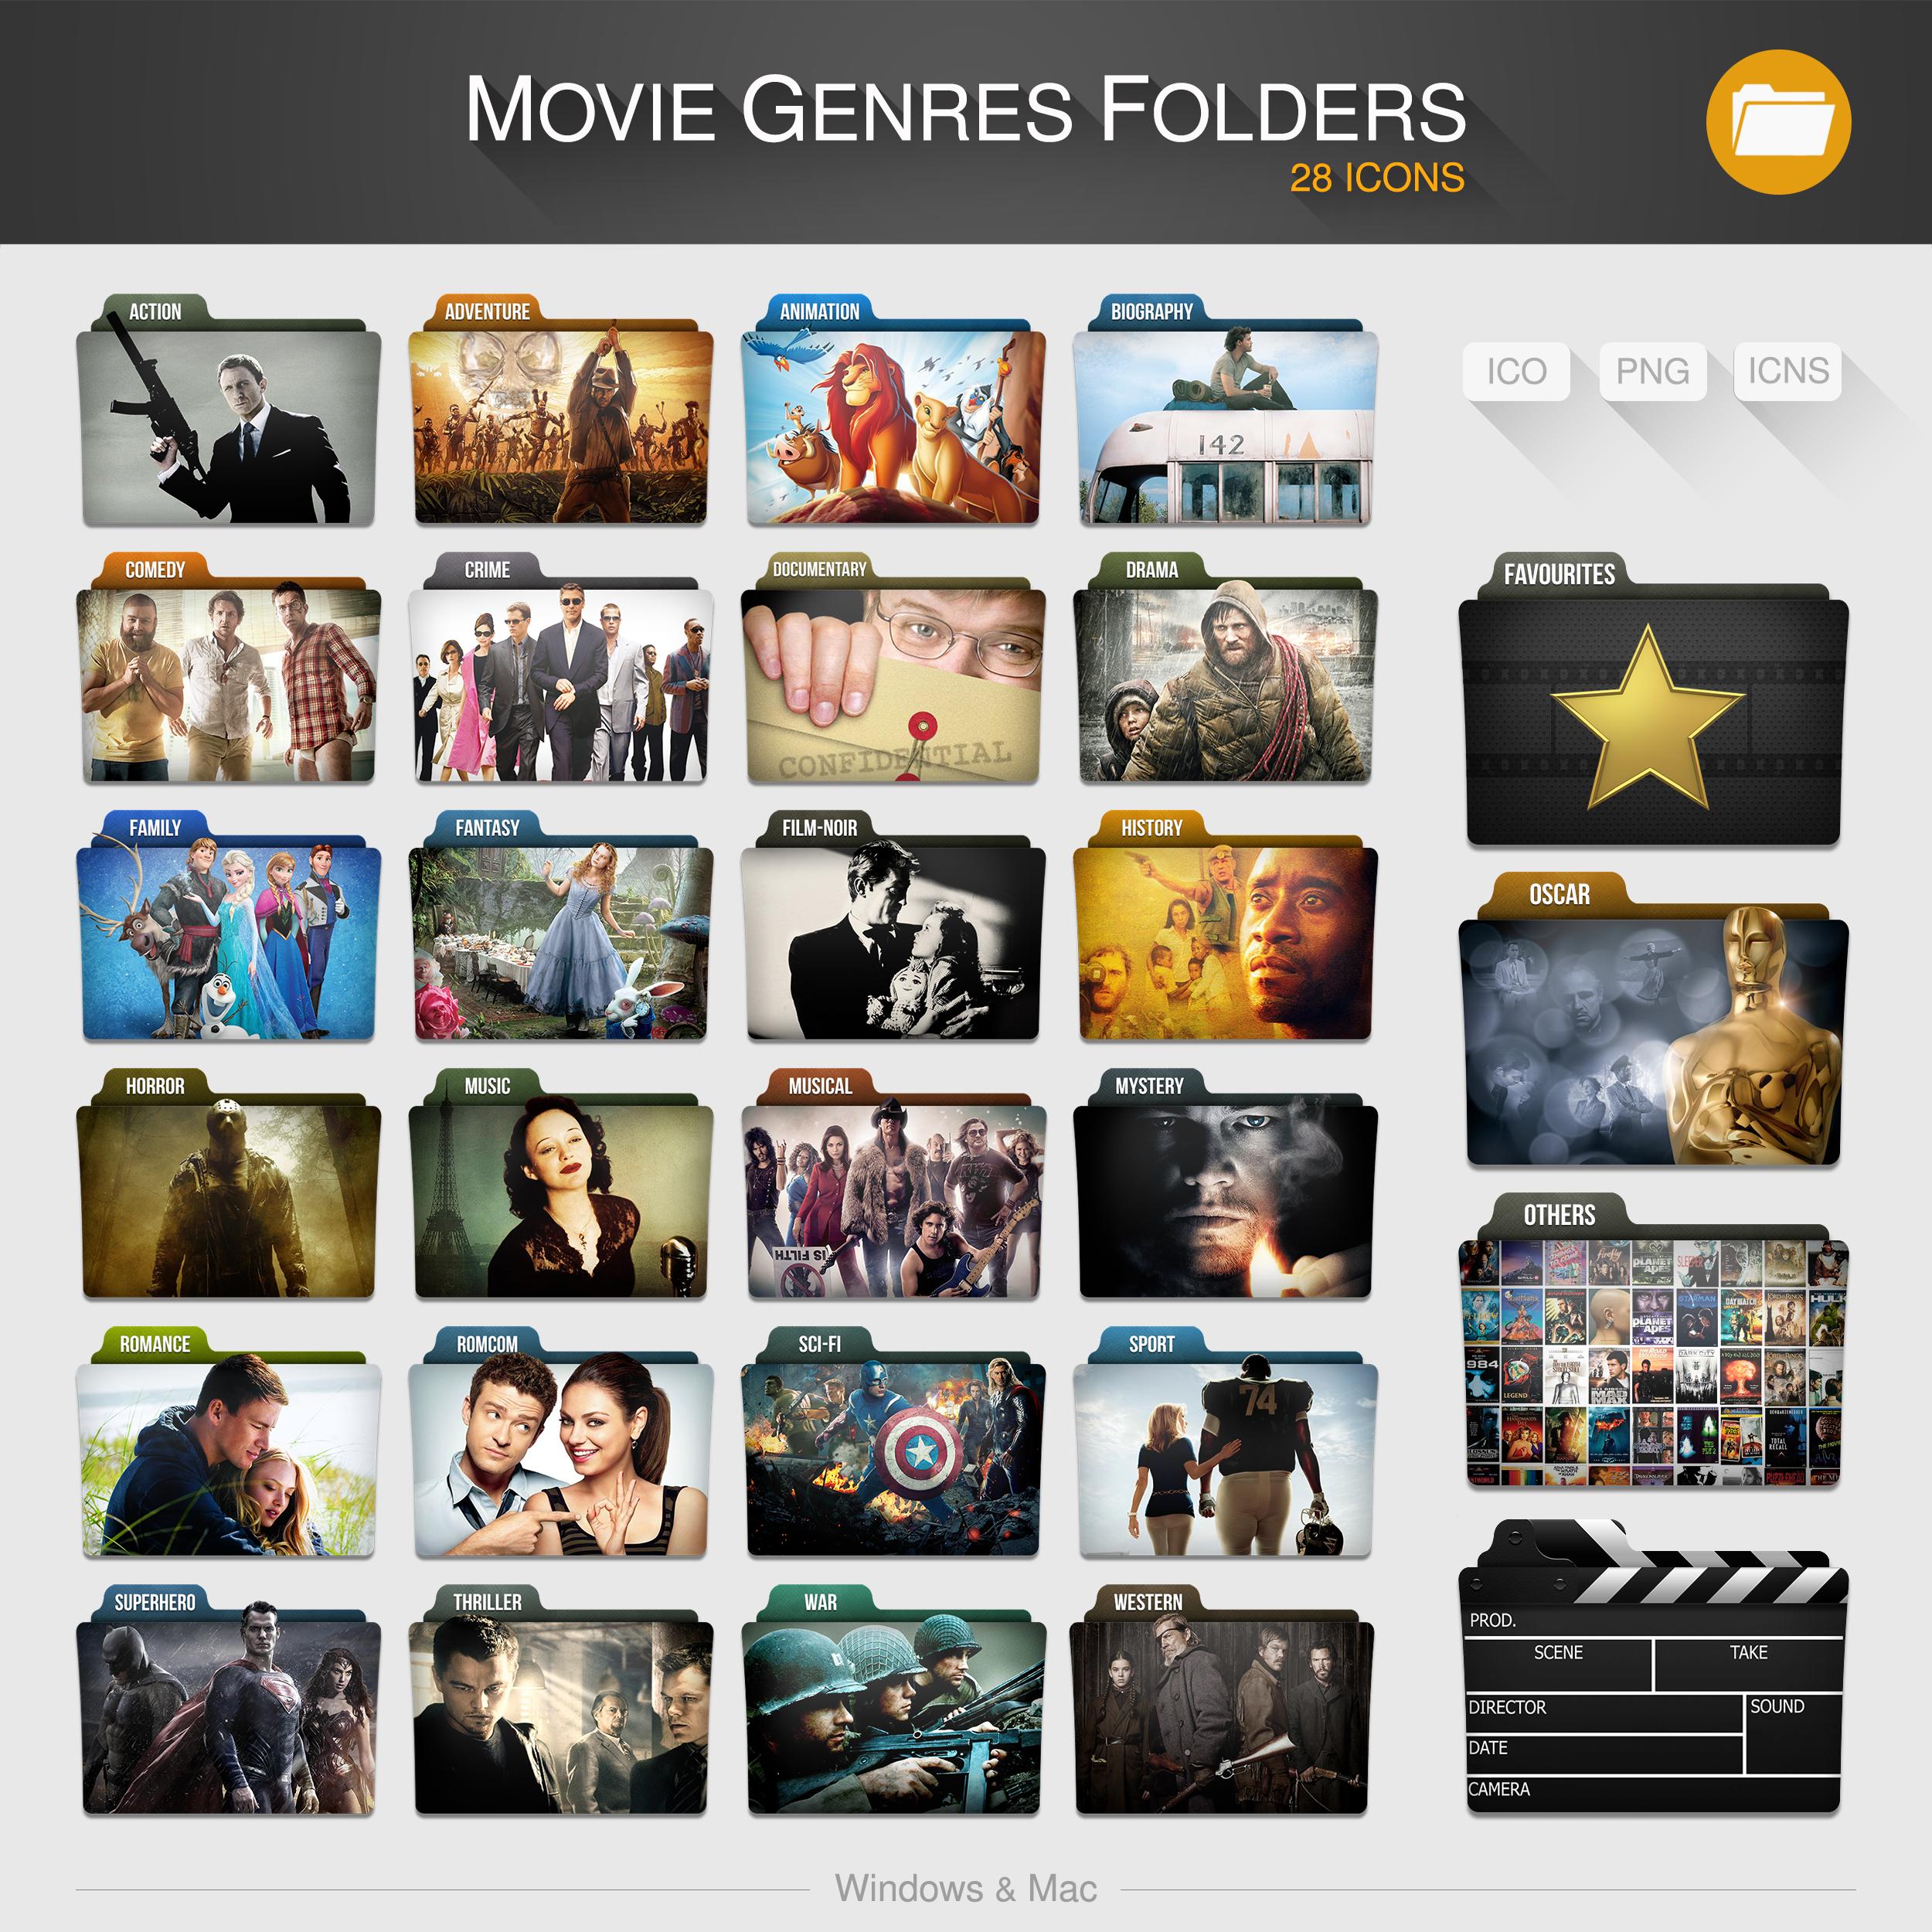 Movie Genres Folders By Limav Movie Genres Folders By Limav